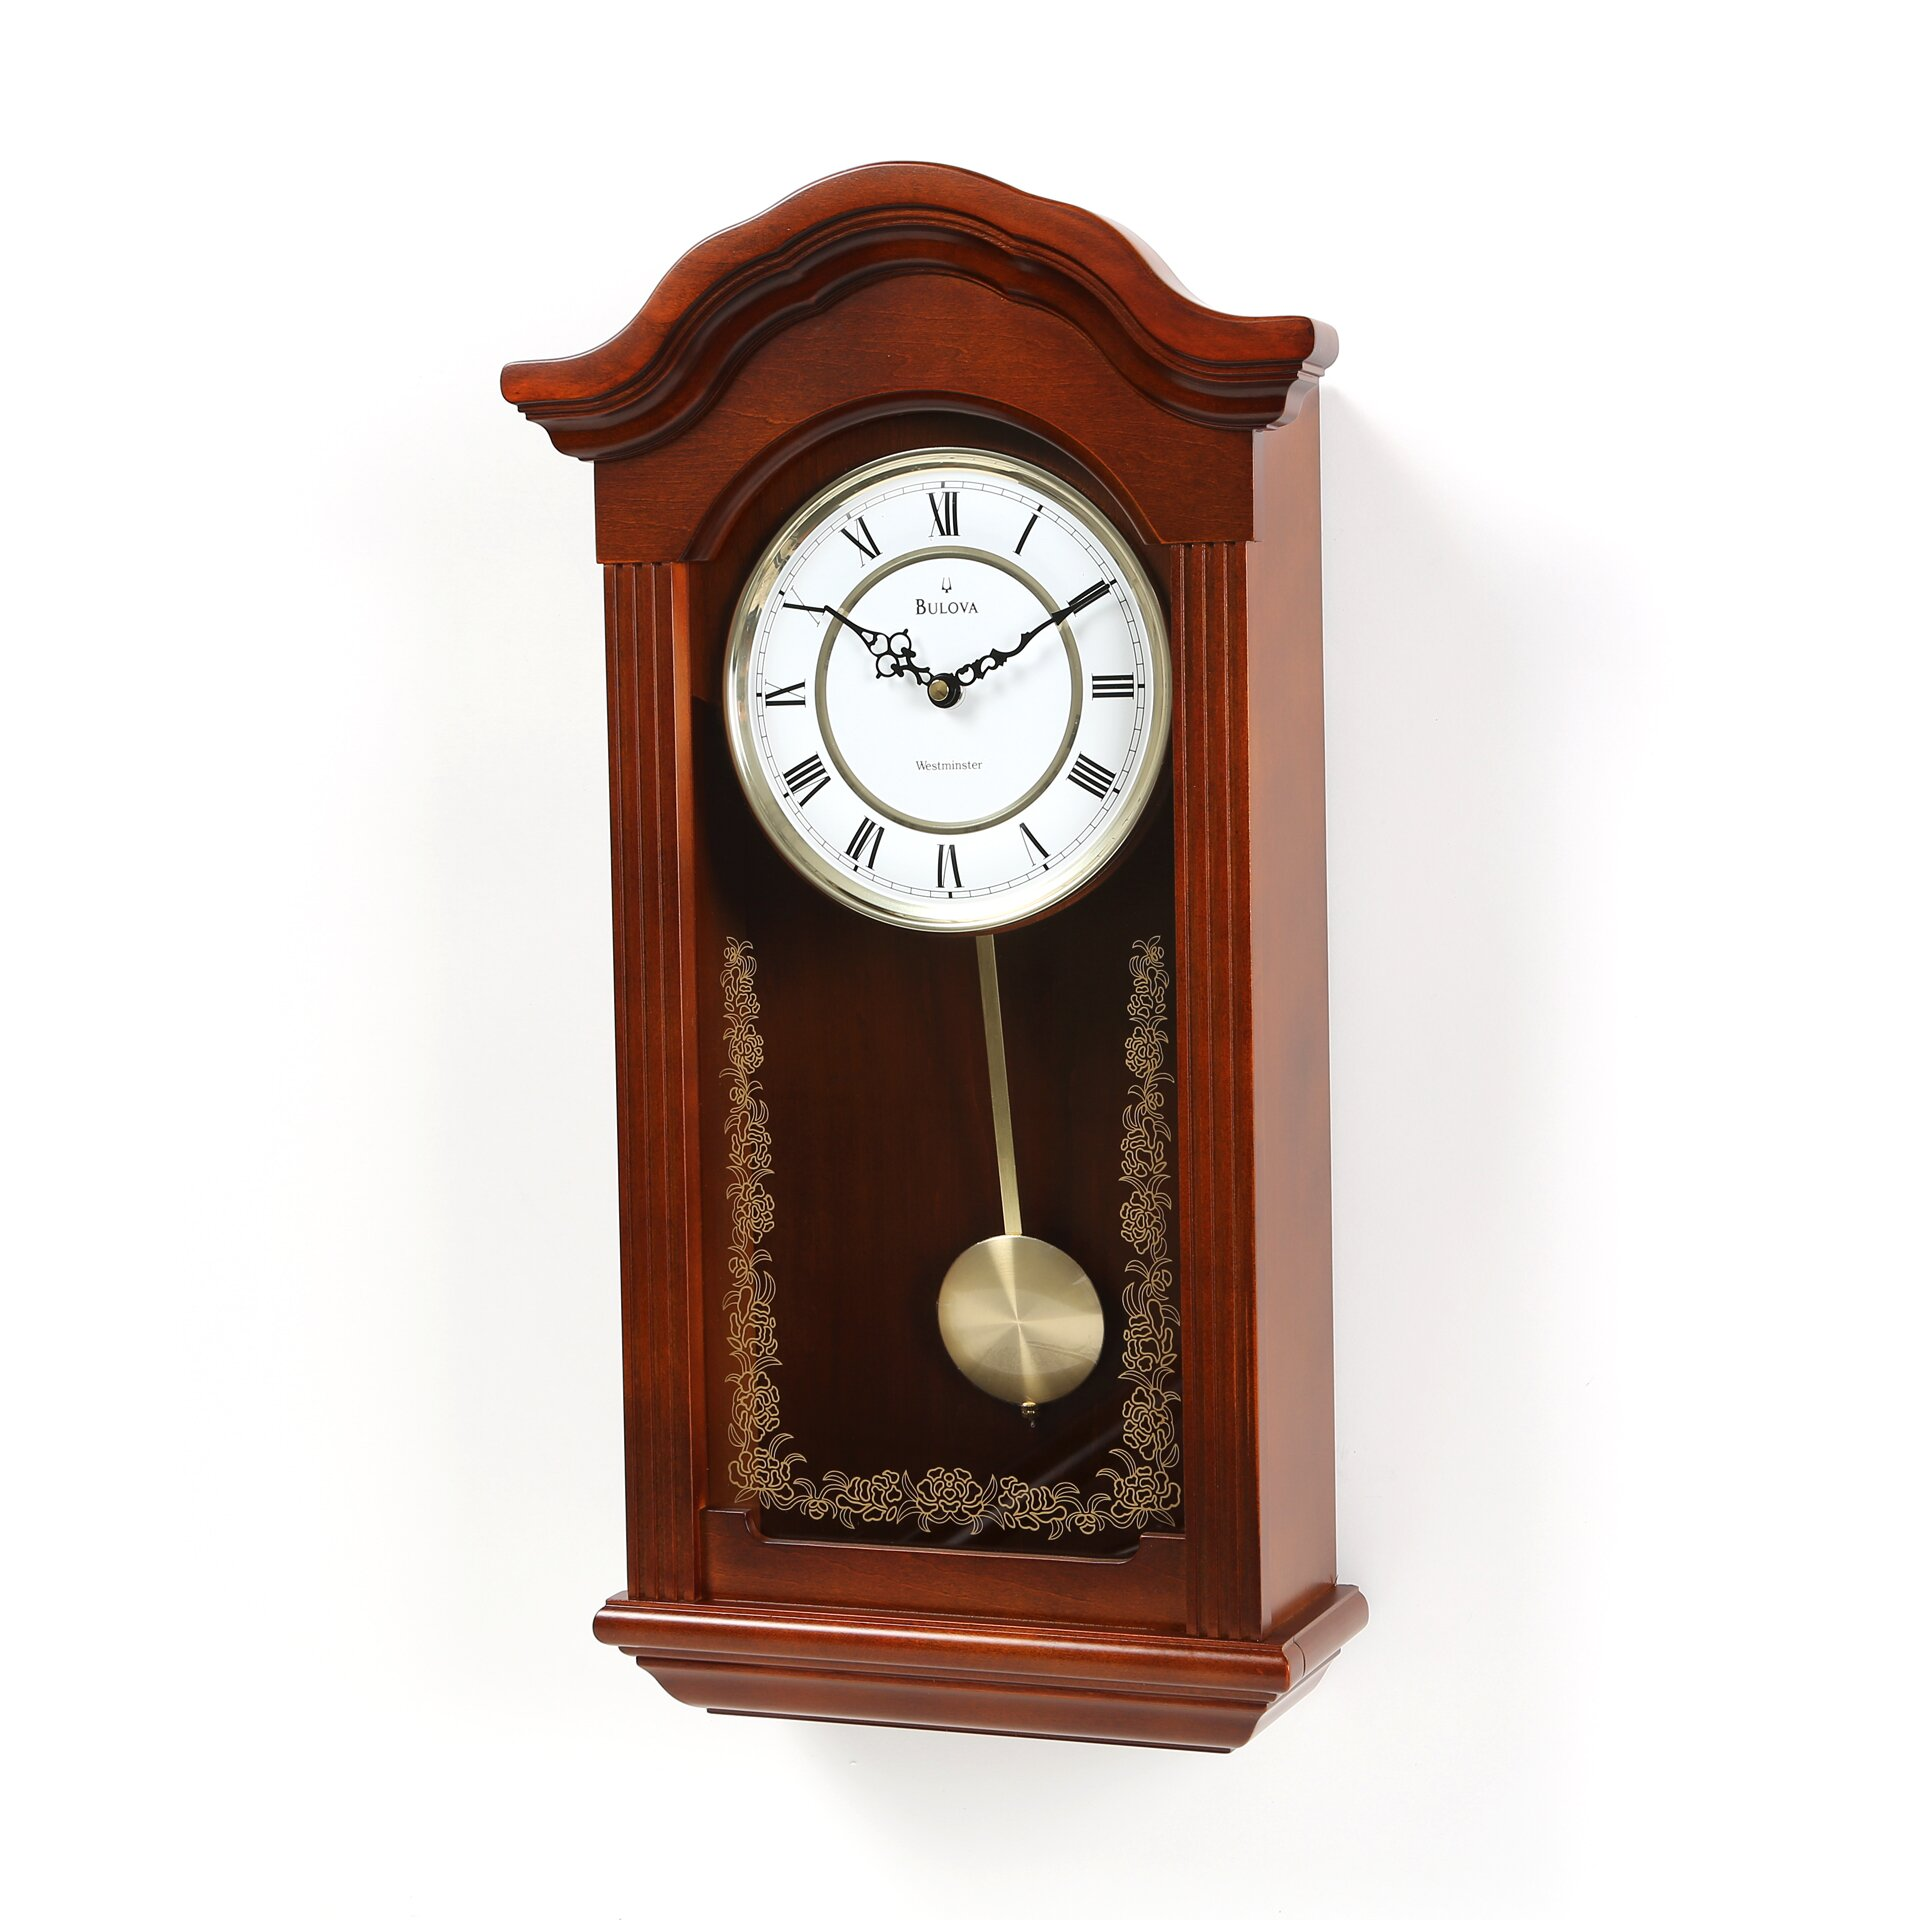 darby home co pendulum wall clock reviews wayfair